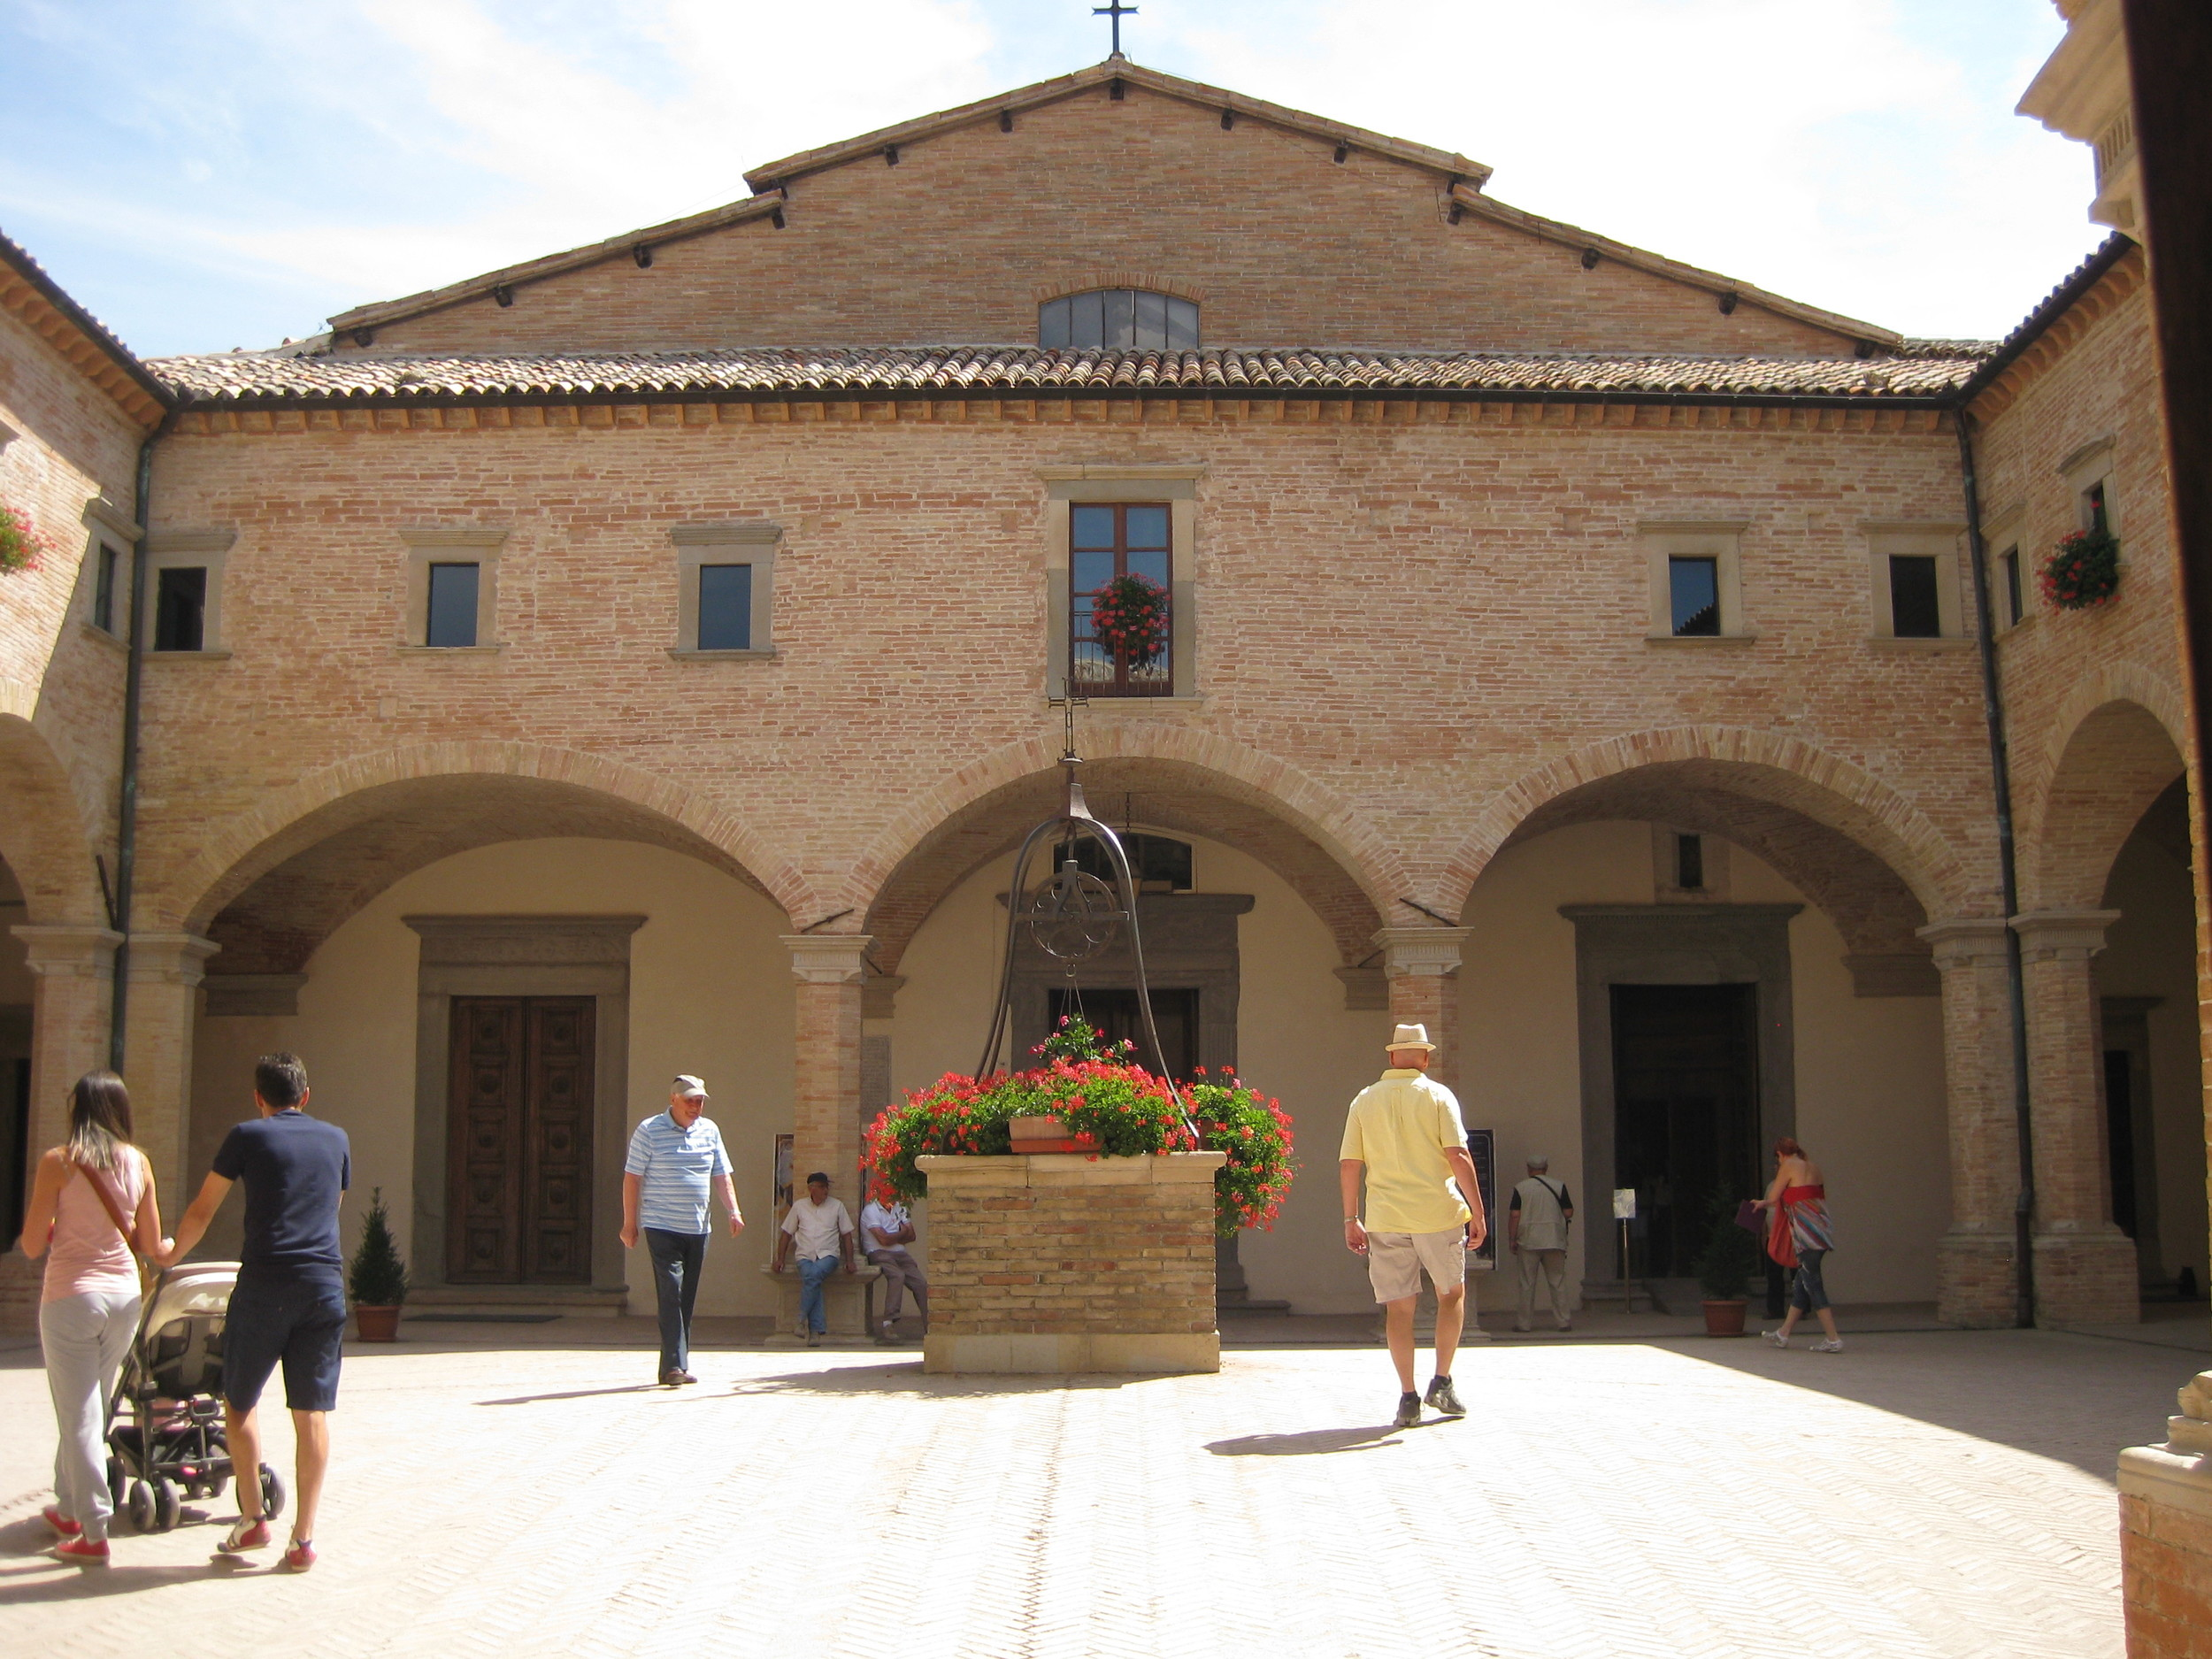 CRO Italy web 2012 - 35.JPG